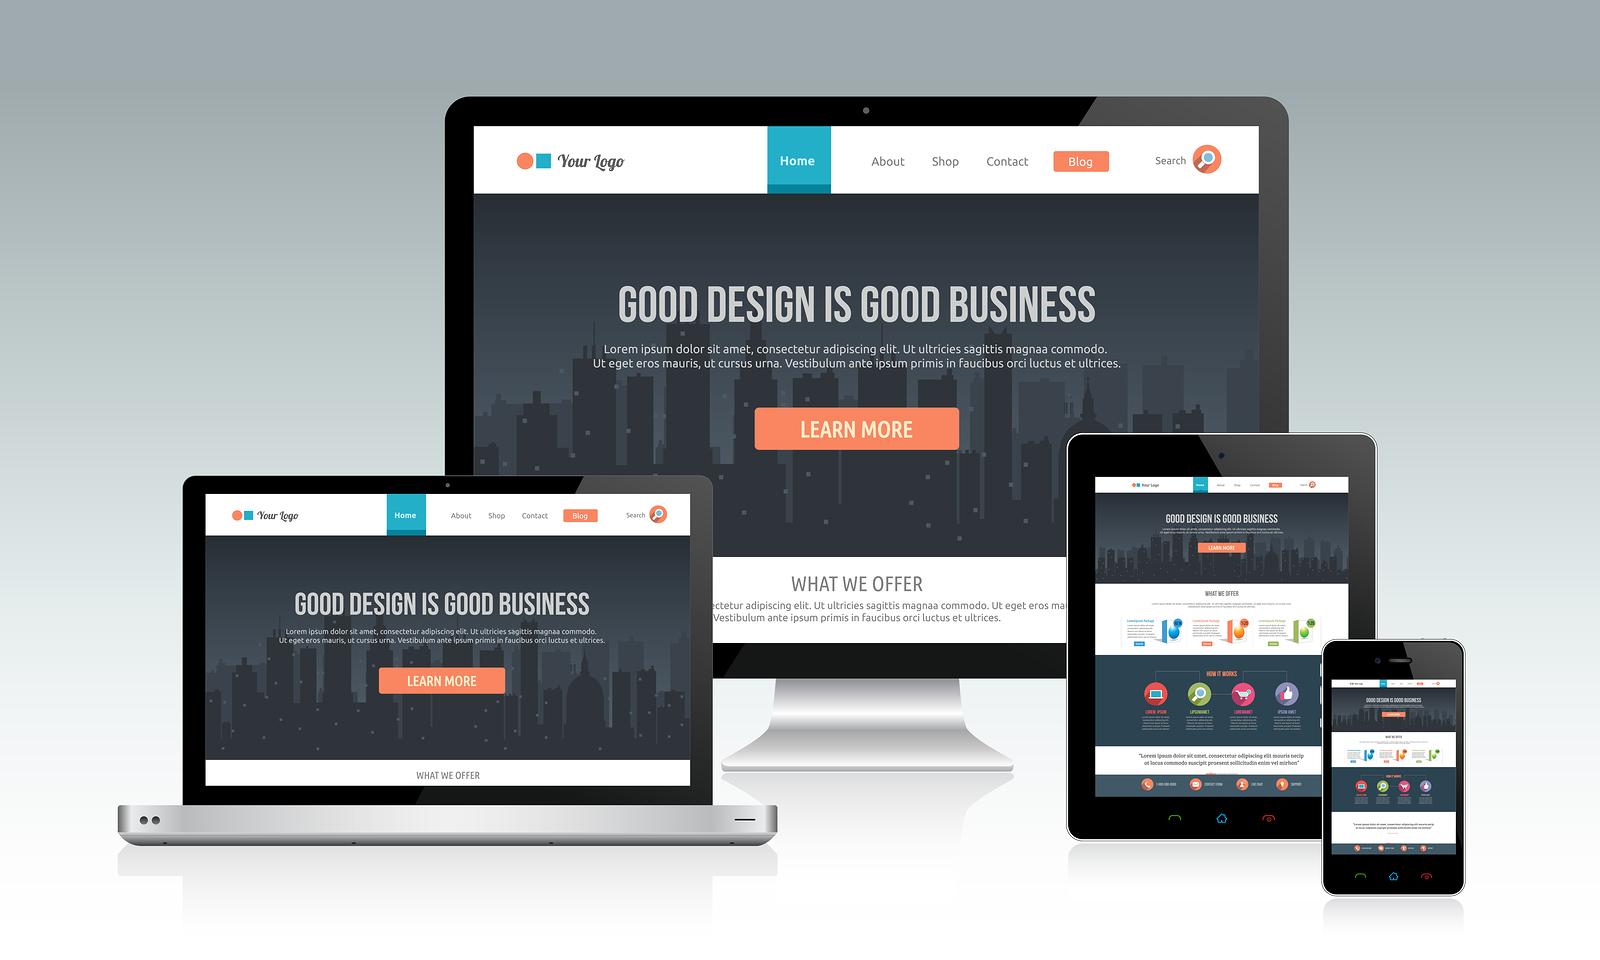 como-crear-un-sitio-web-para-mi-negocio